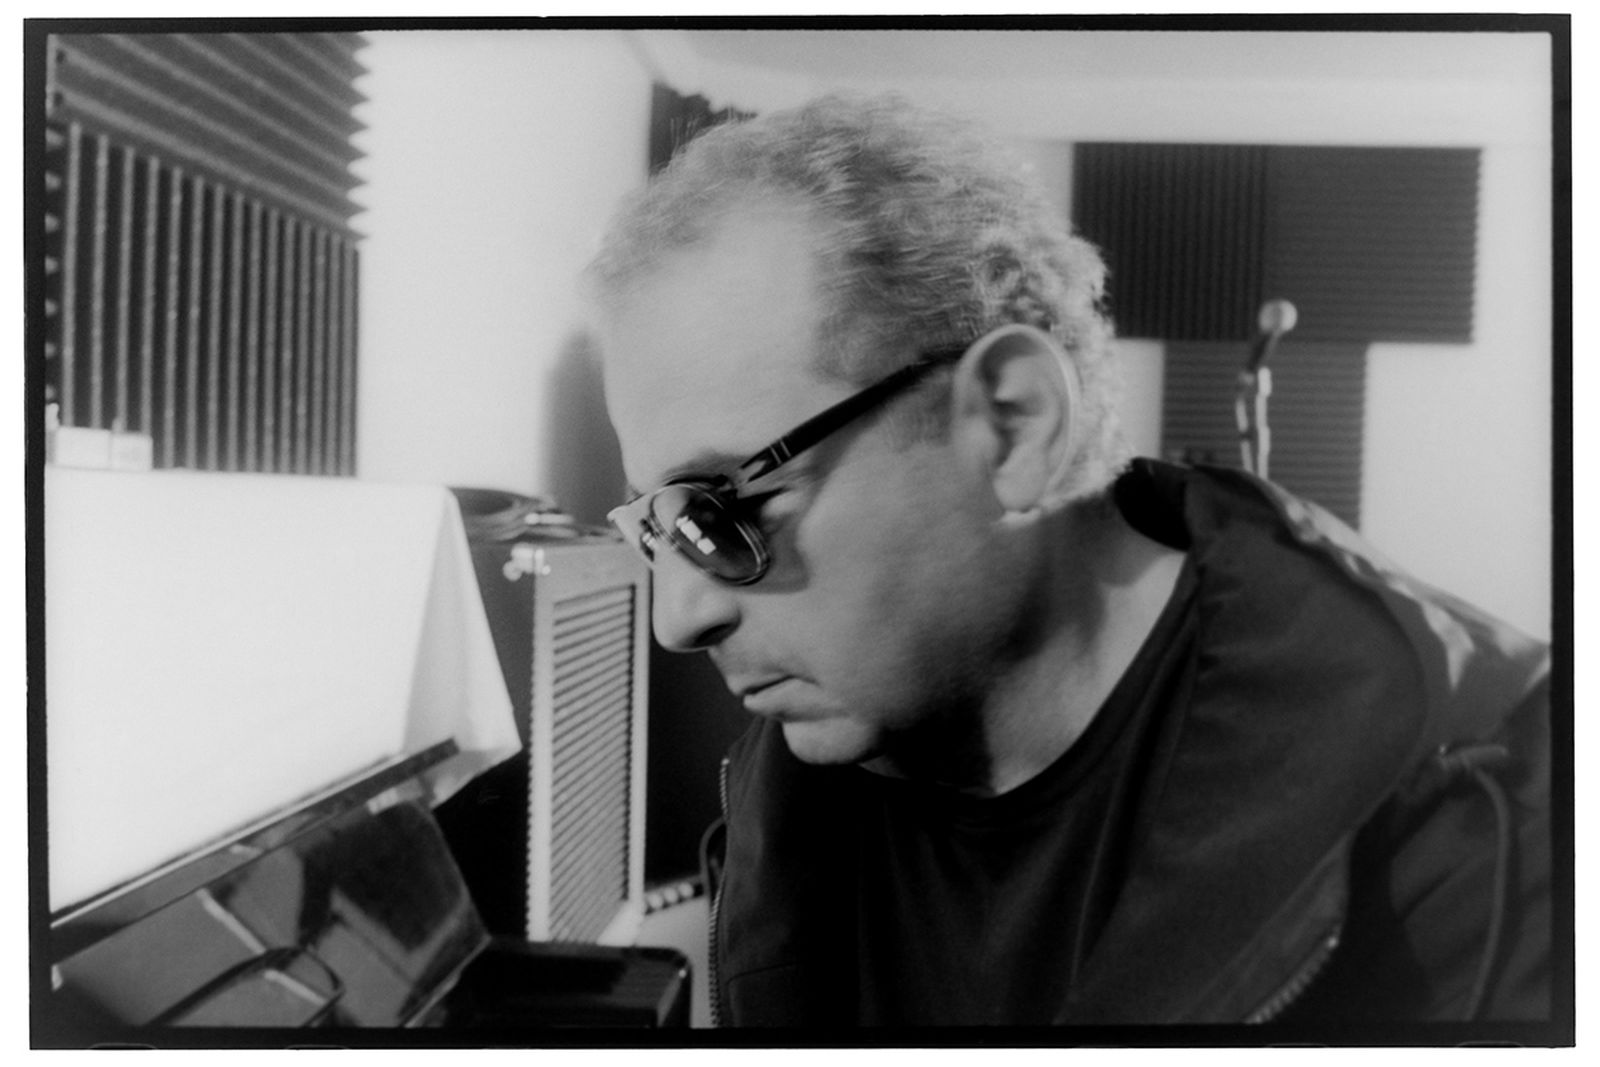 Jean Touitou A.P.C. Persol Sunglasses